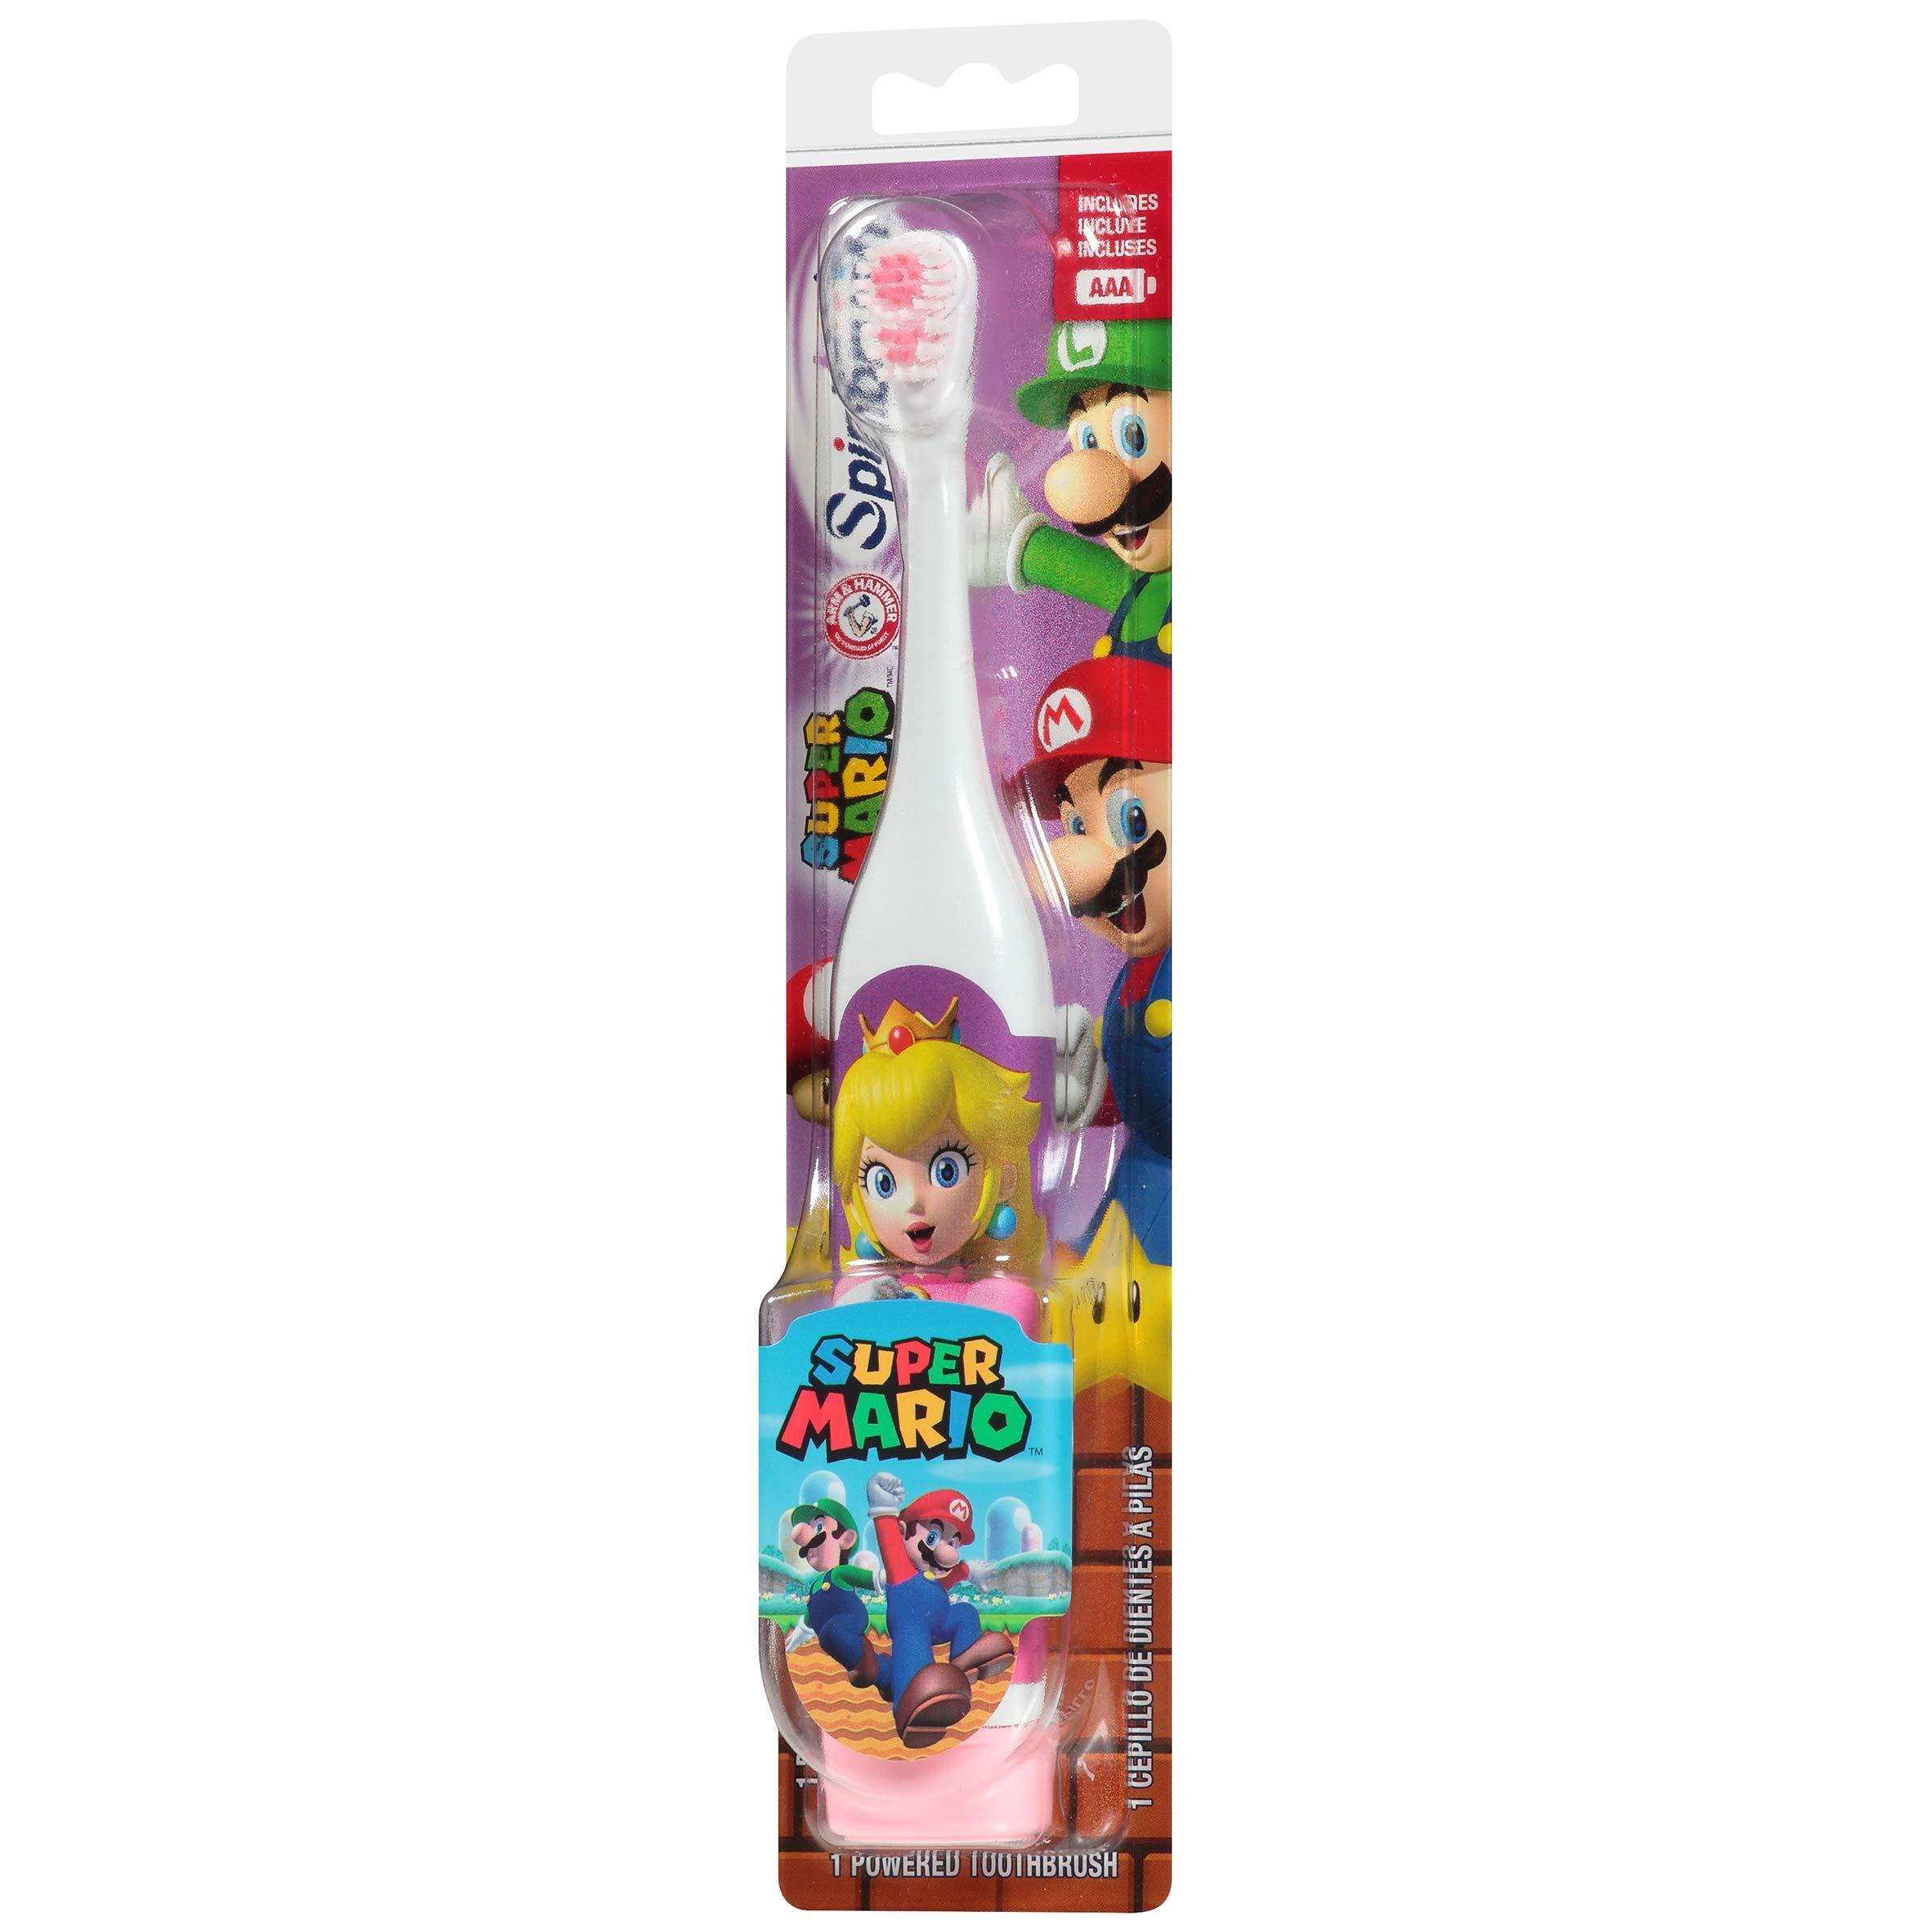 ARM & HAMMER Kid's Spinbrush Powered Toothbrush, Super Mario 1 ea (Pack of 3)